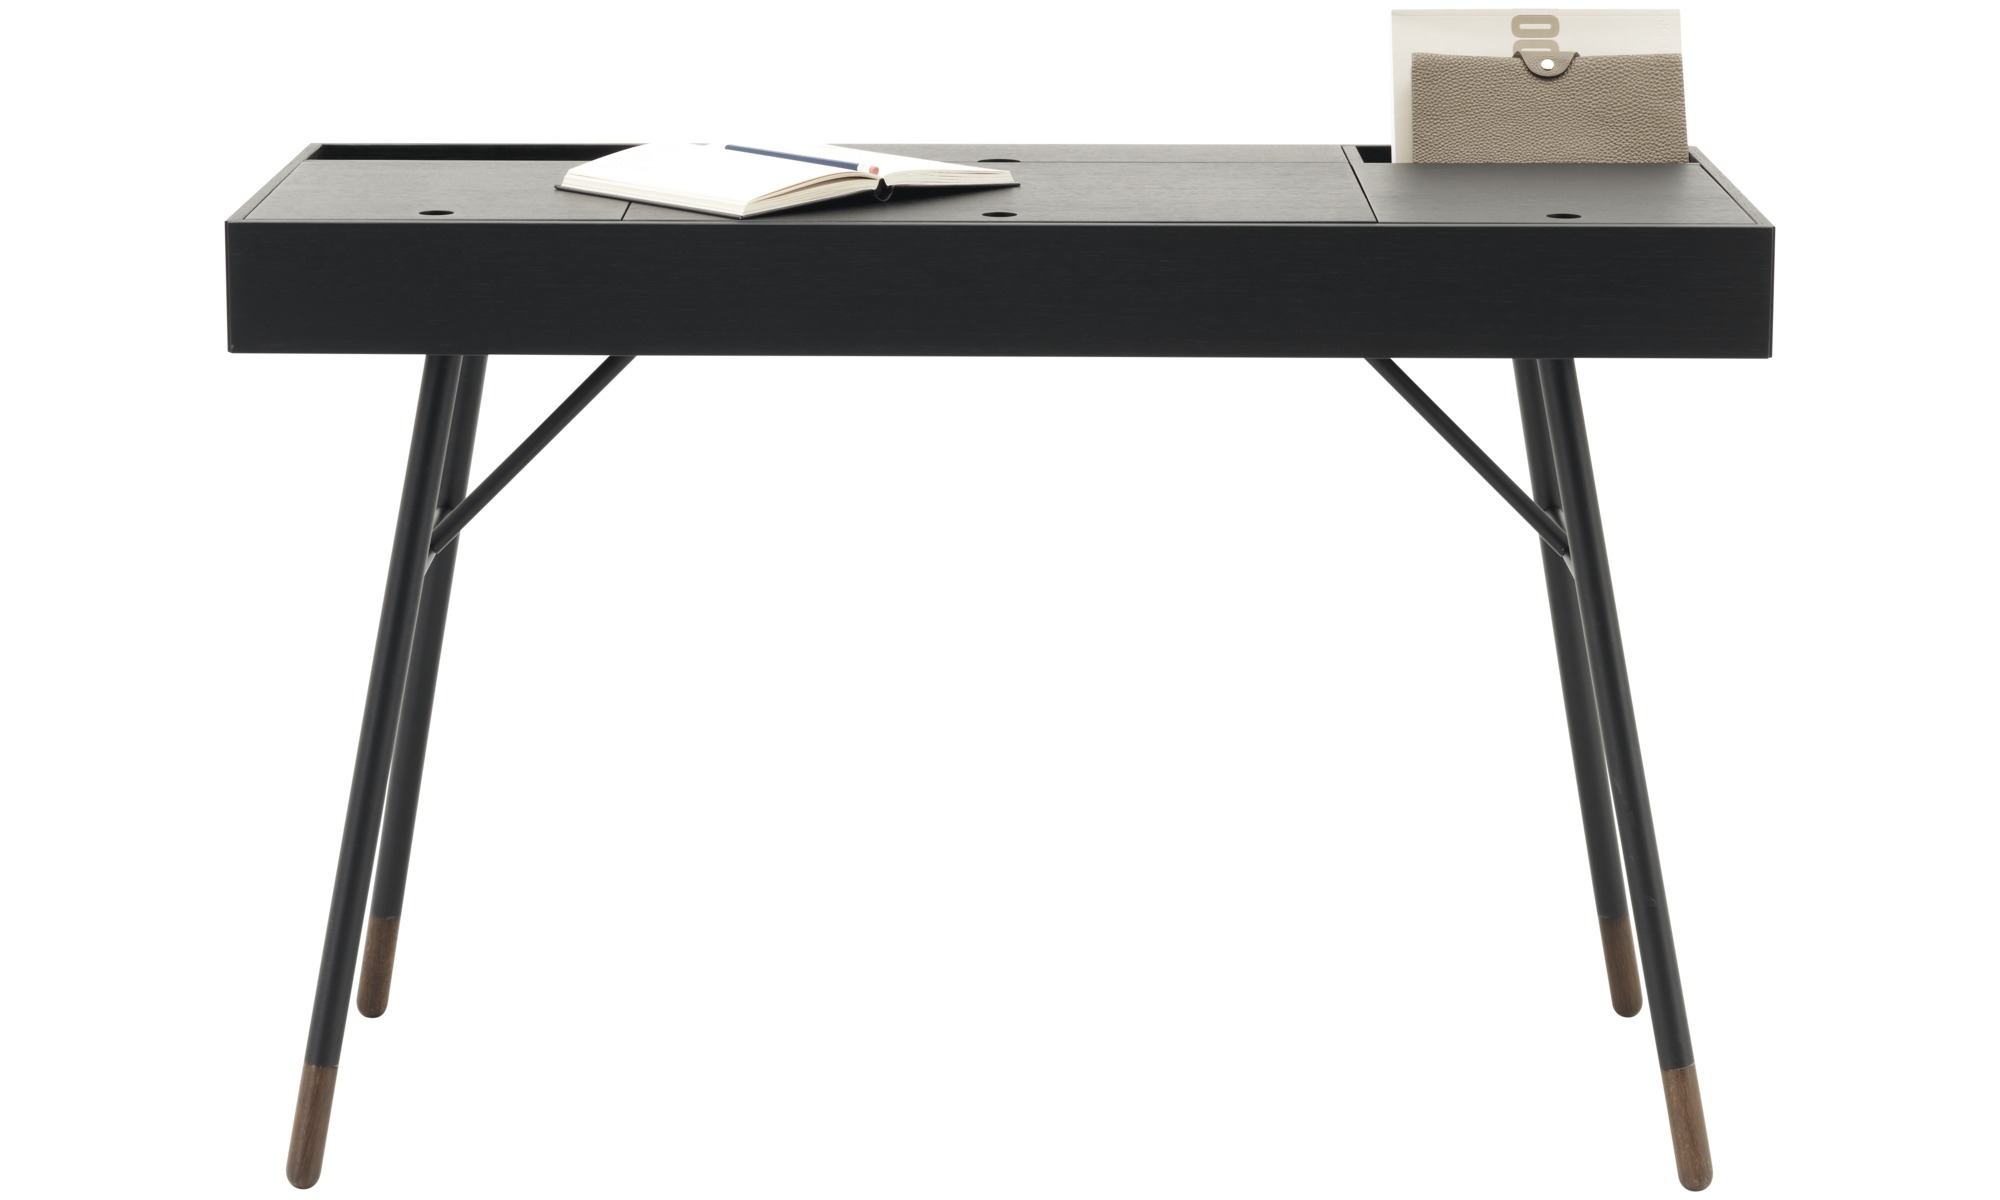 Desks - Cupertino desk - rectangular - Black - Oak